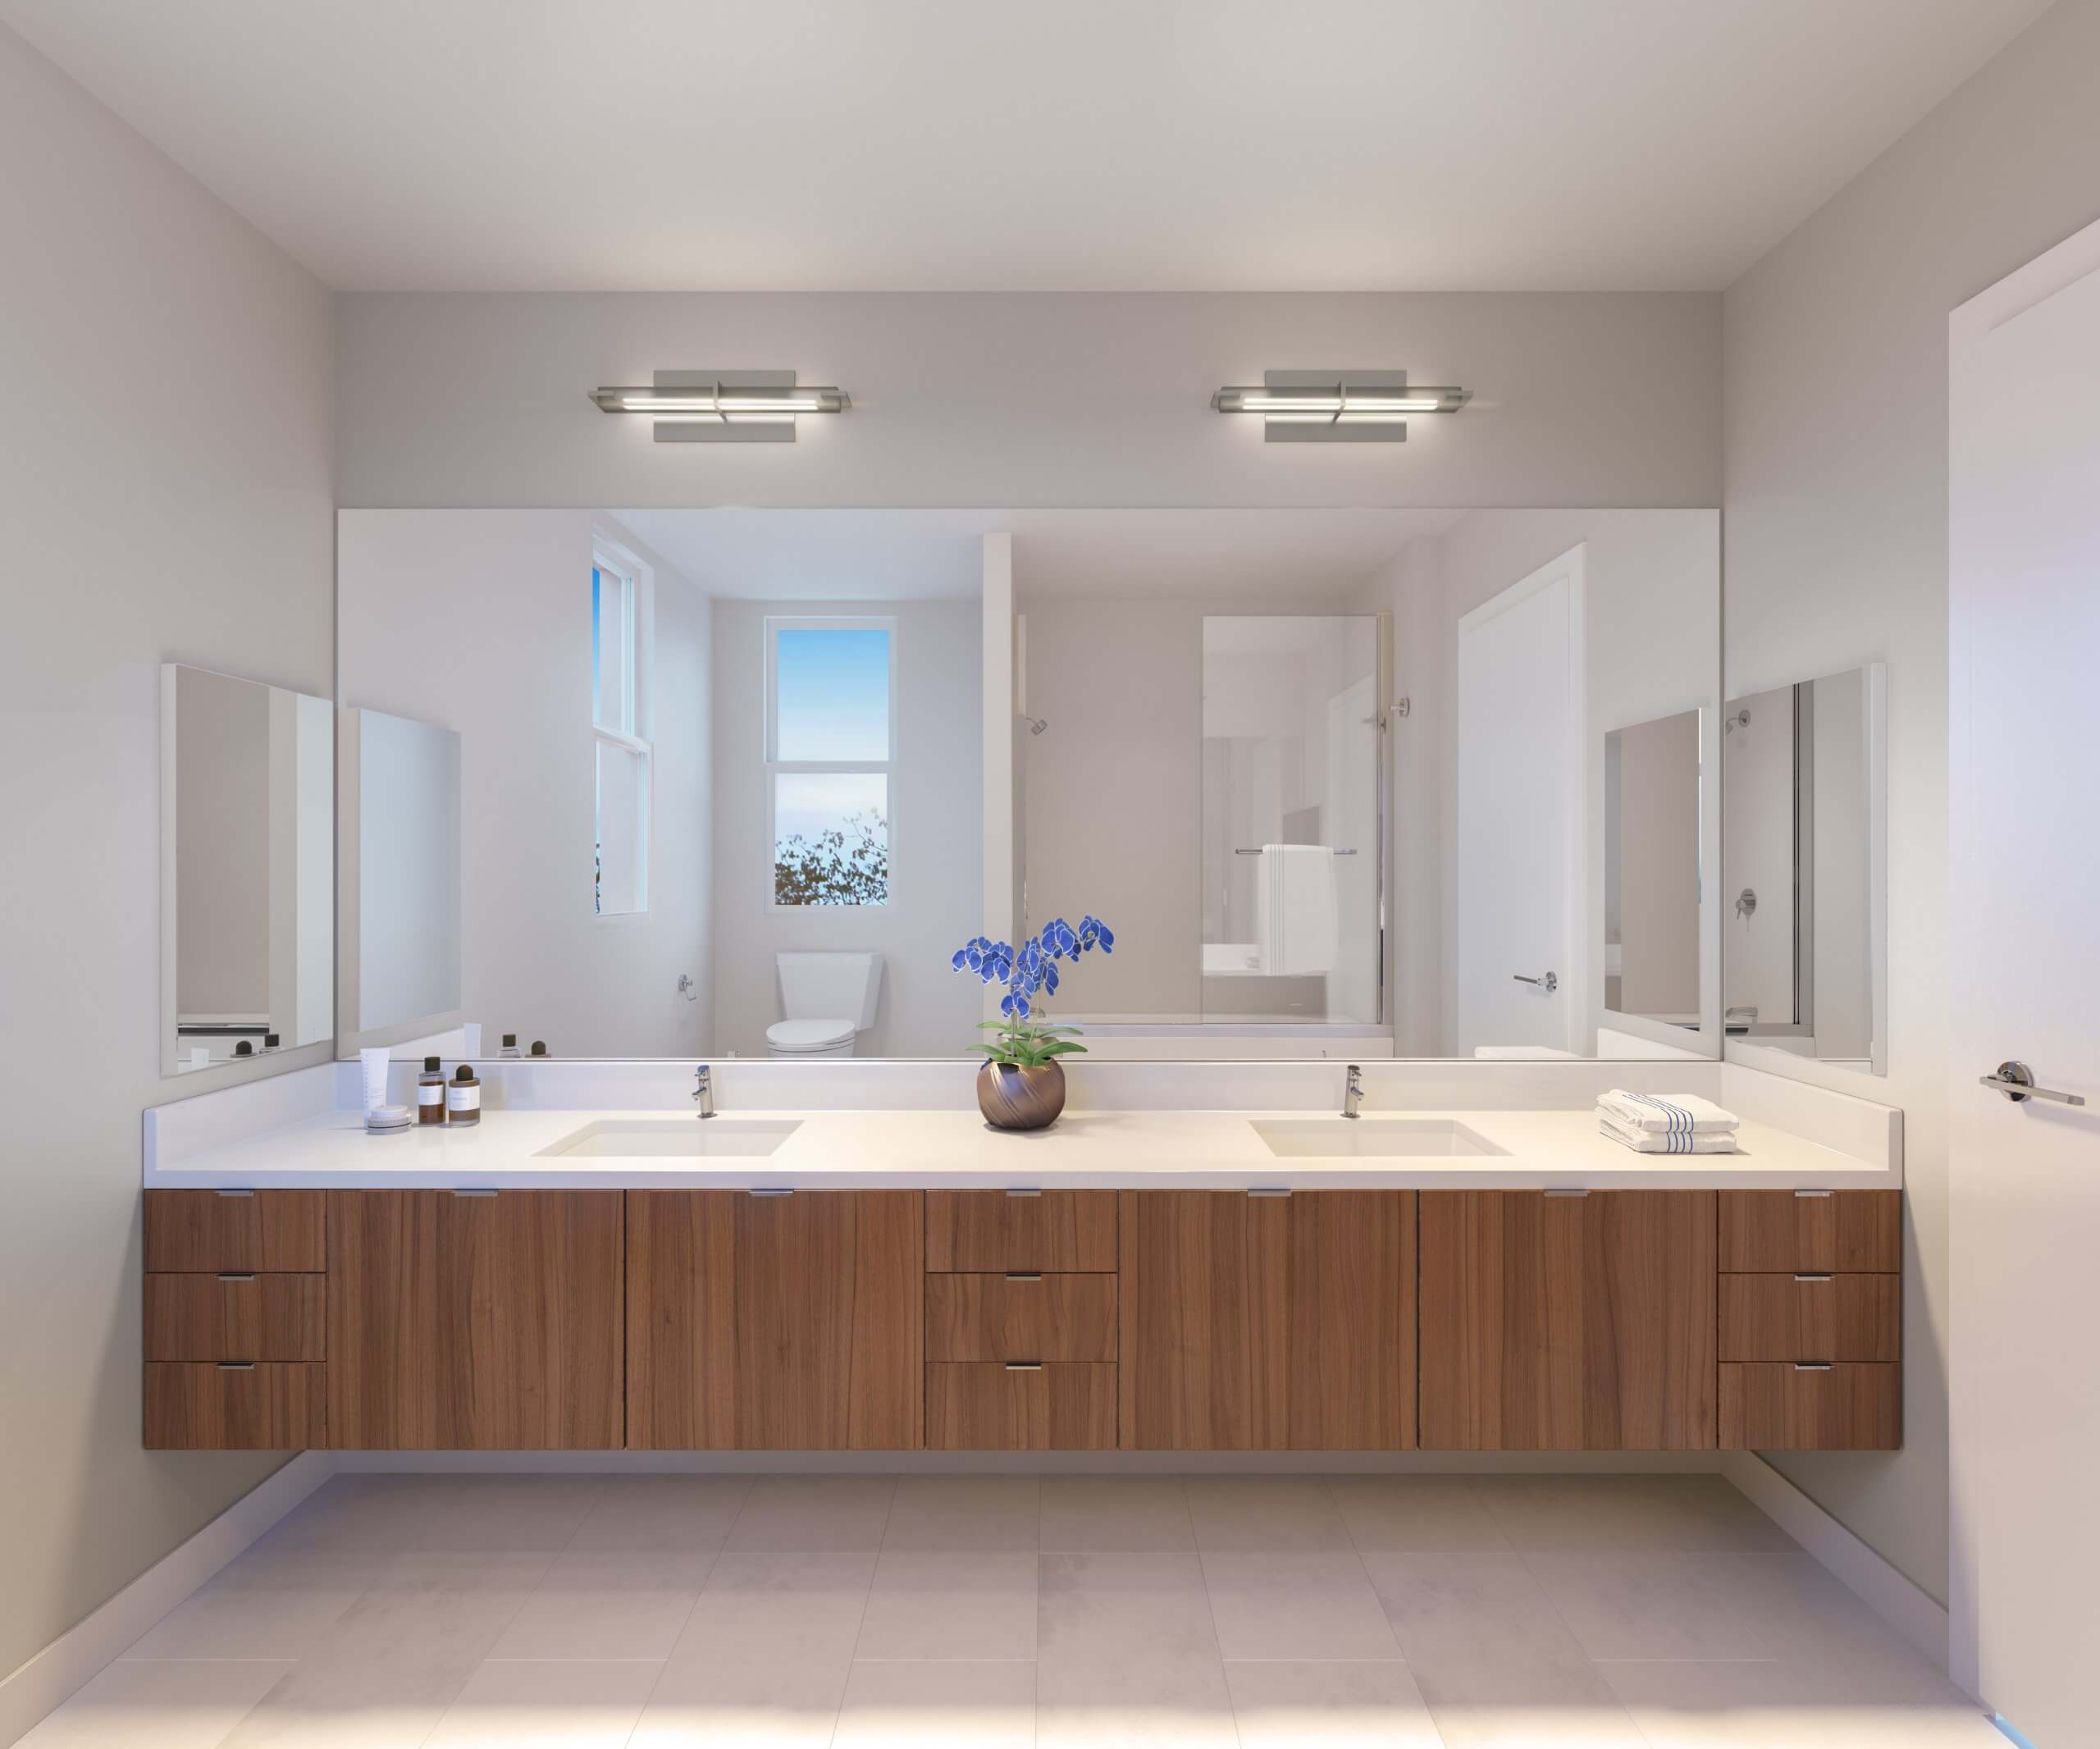 EG001-Regis-Homes-1101-West-Mountain-ViewCA-C01_Bathroom_Dusk-R3